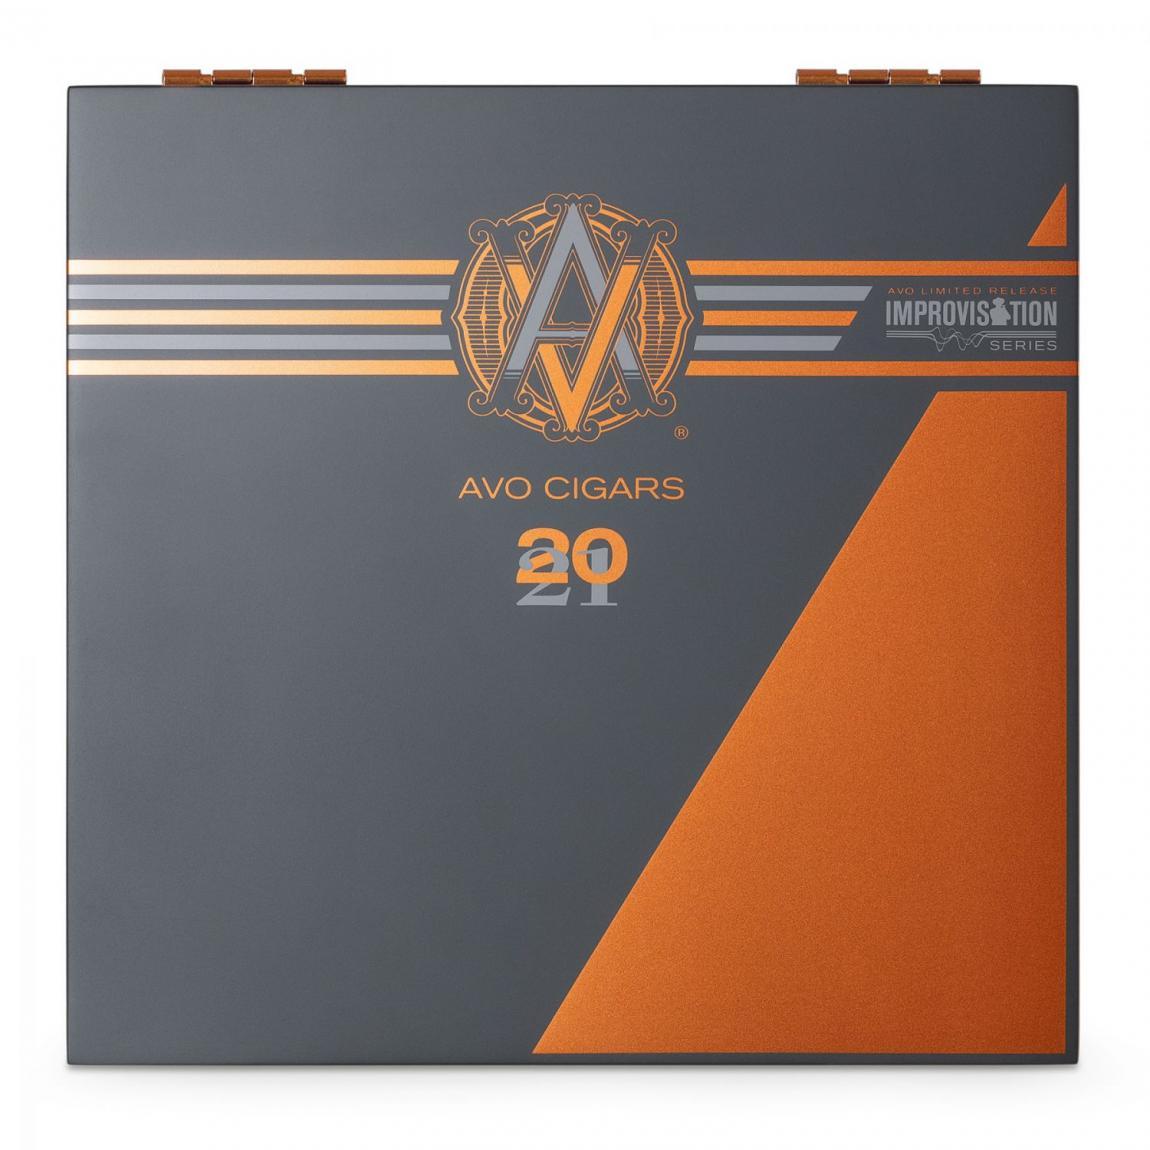 AVO Improvisation Series Limited Edition 2021, 20er Kiste